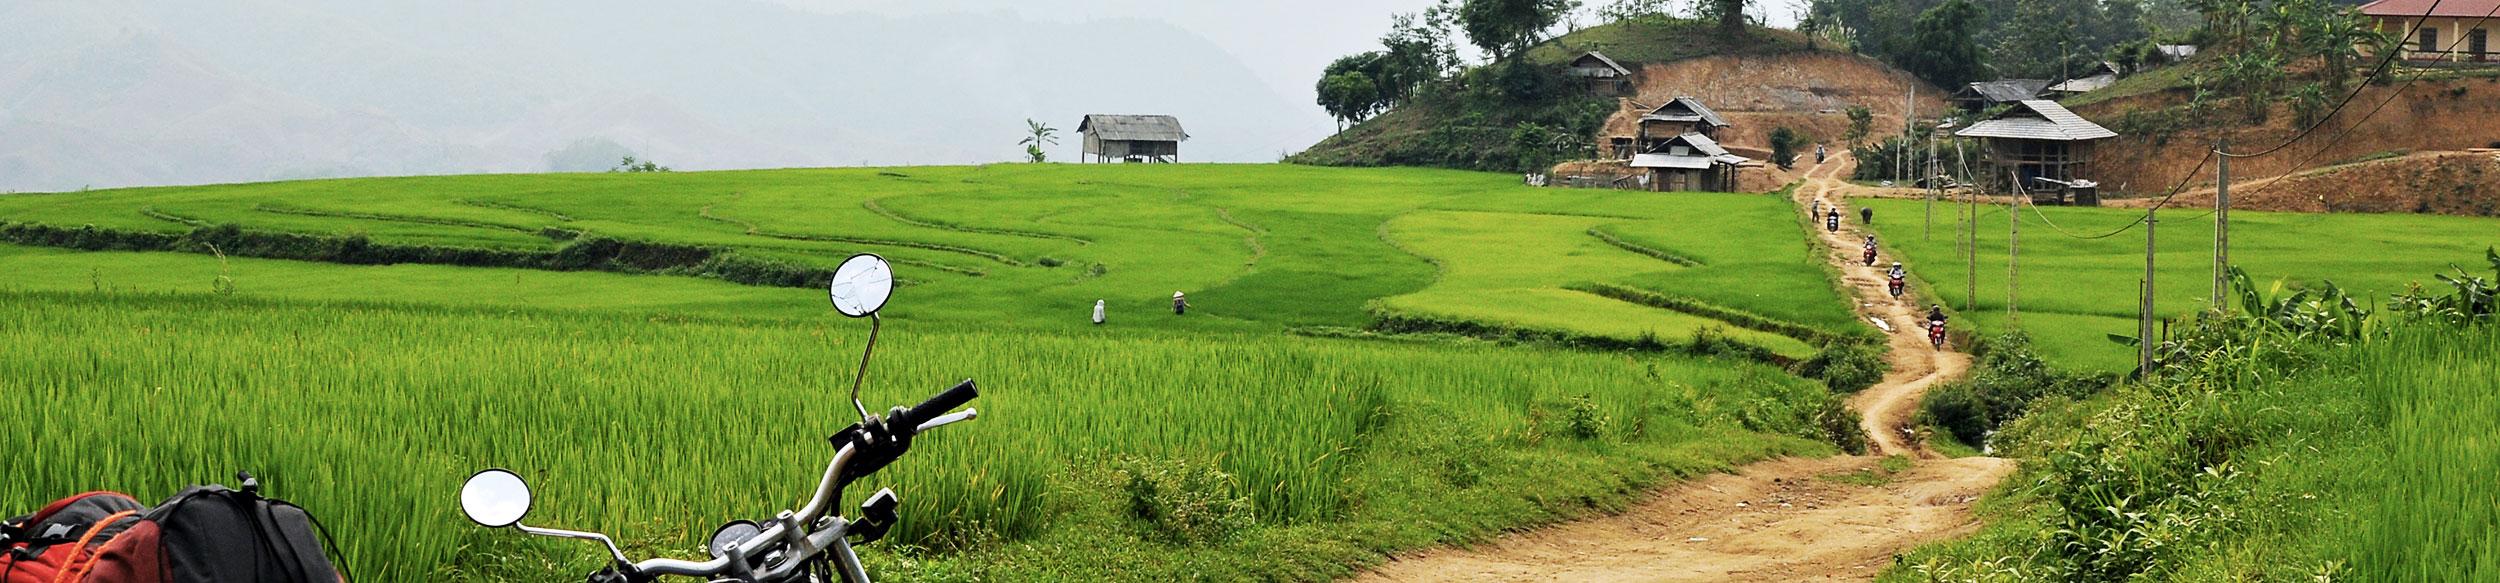 road trip à moto au nord Vietnam